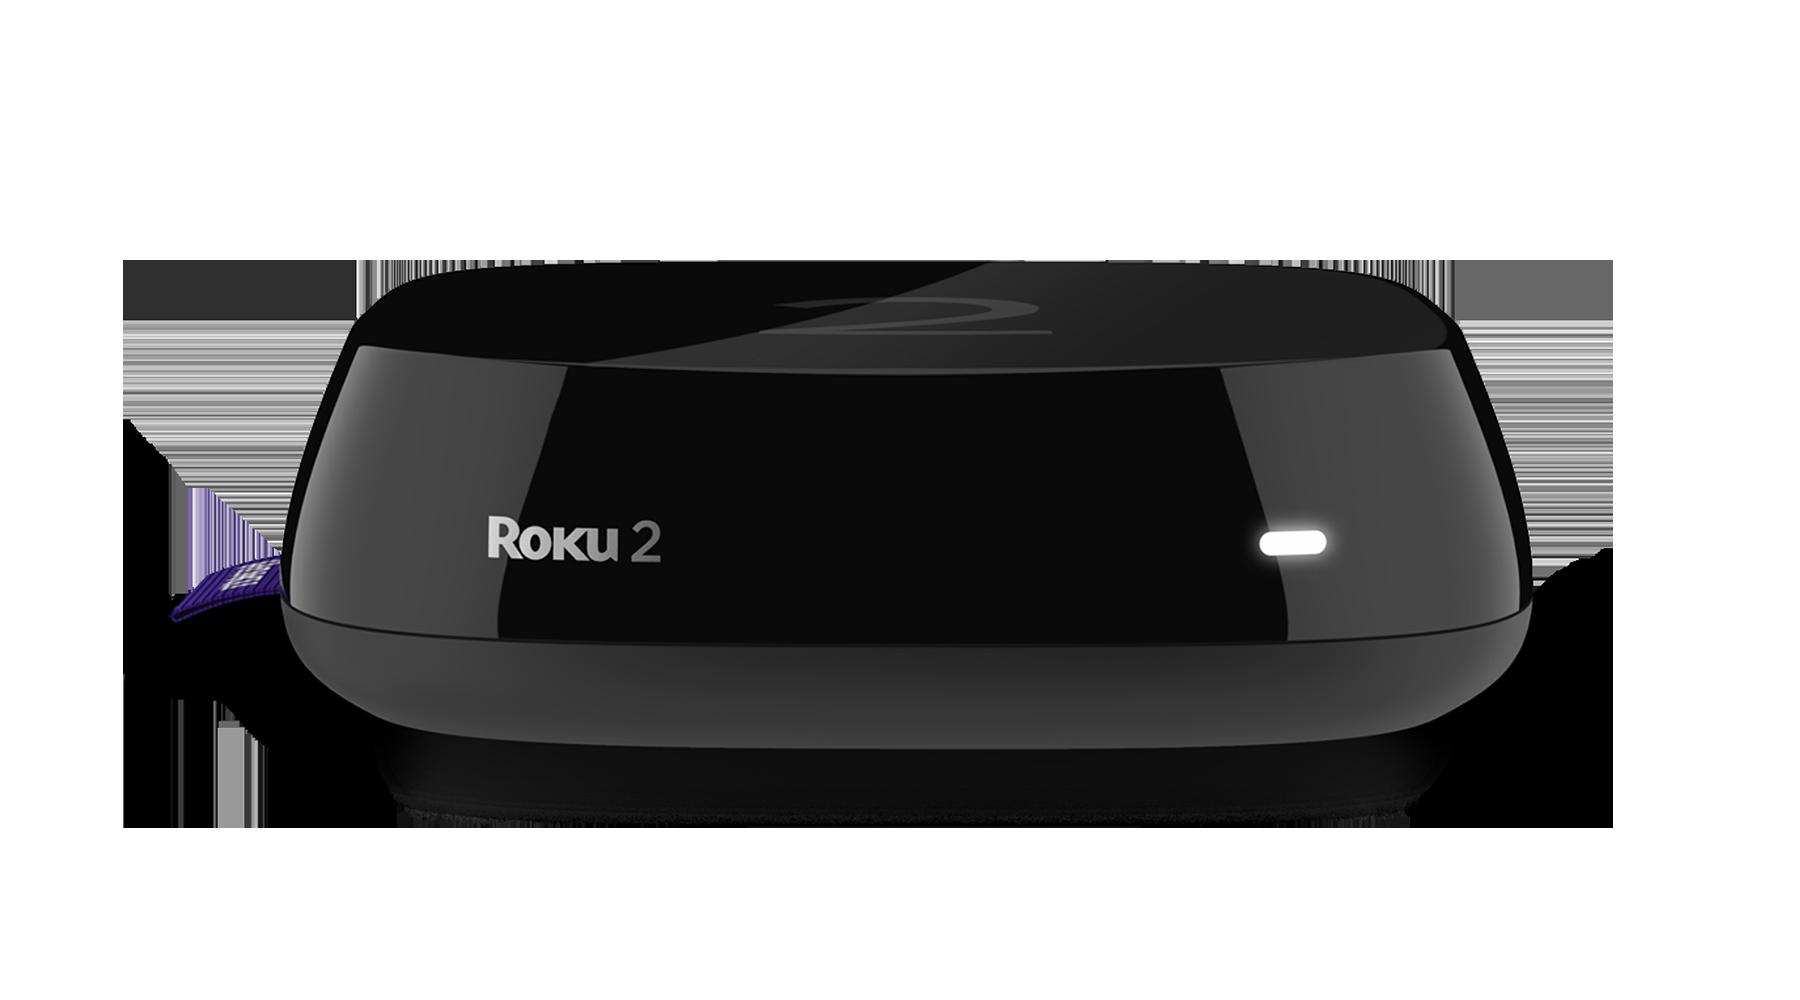 Roku 2 - Front 2